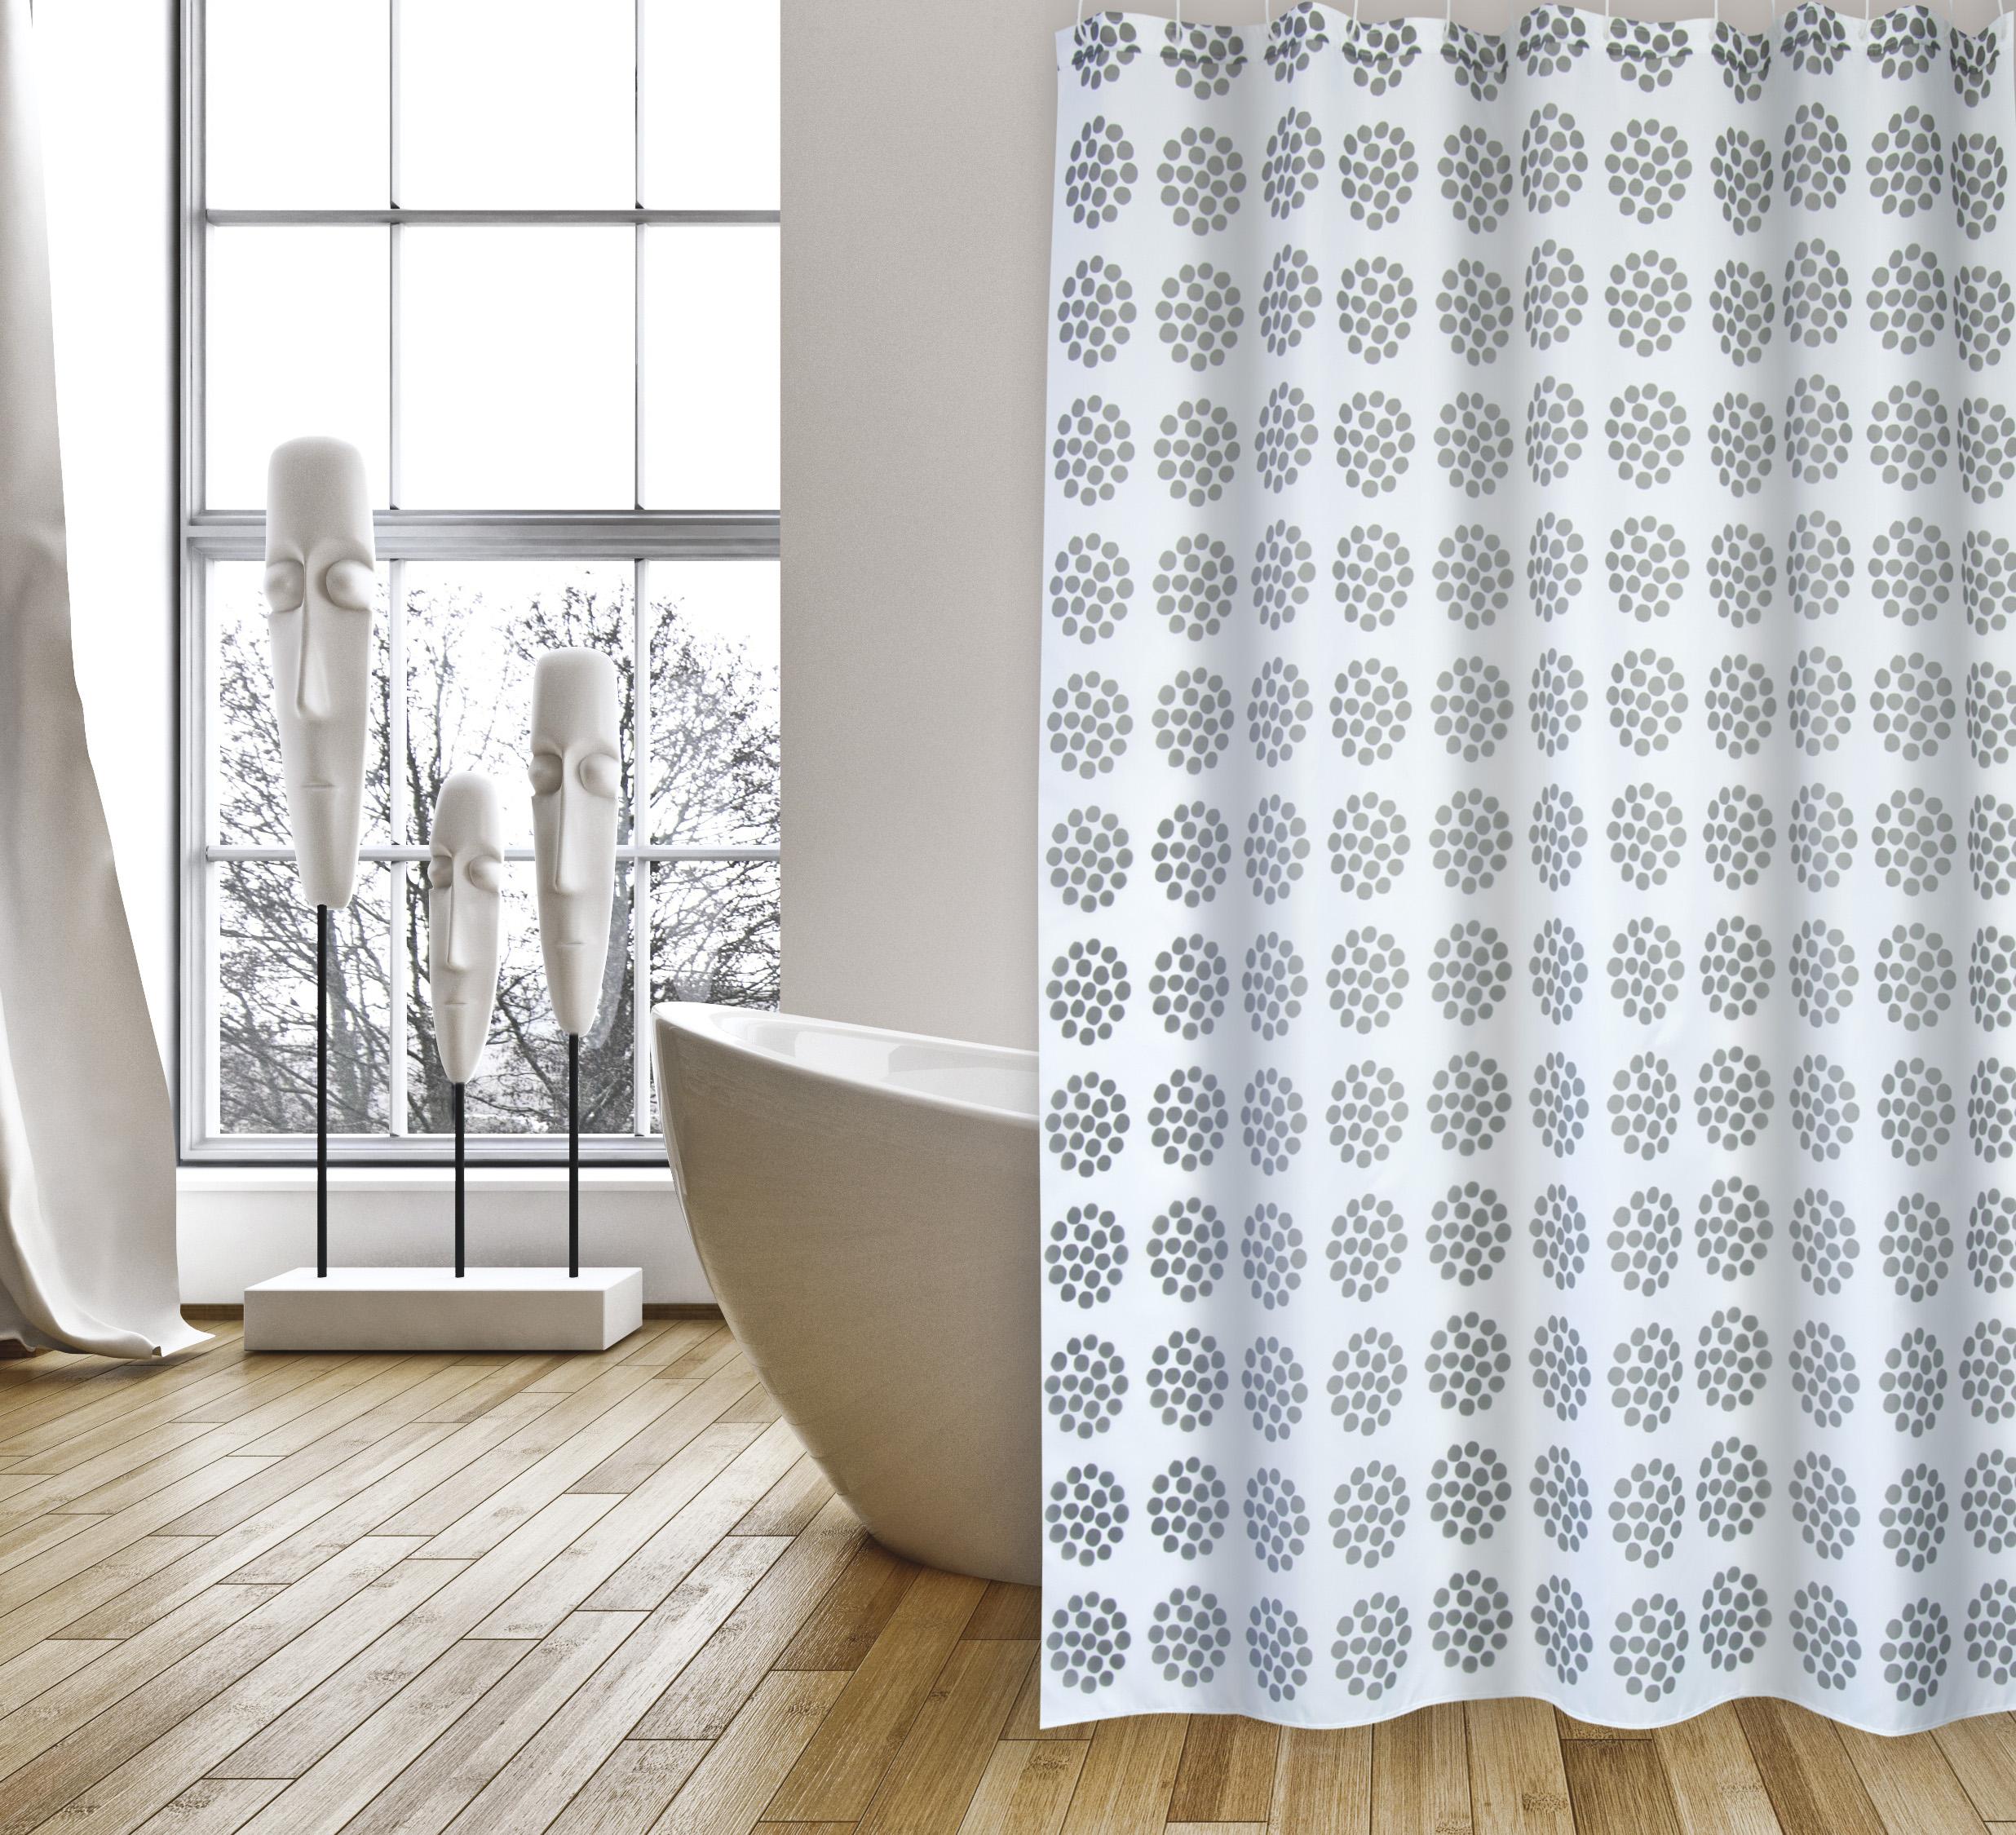 MSV Duschvorhang 180x200cm Anti Schimmel Textil Badewannenvorhang Wannenvorhang Bregonia